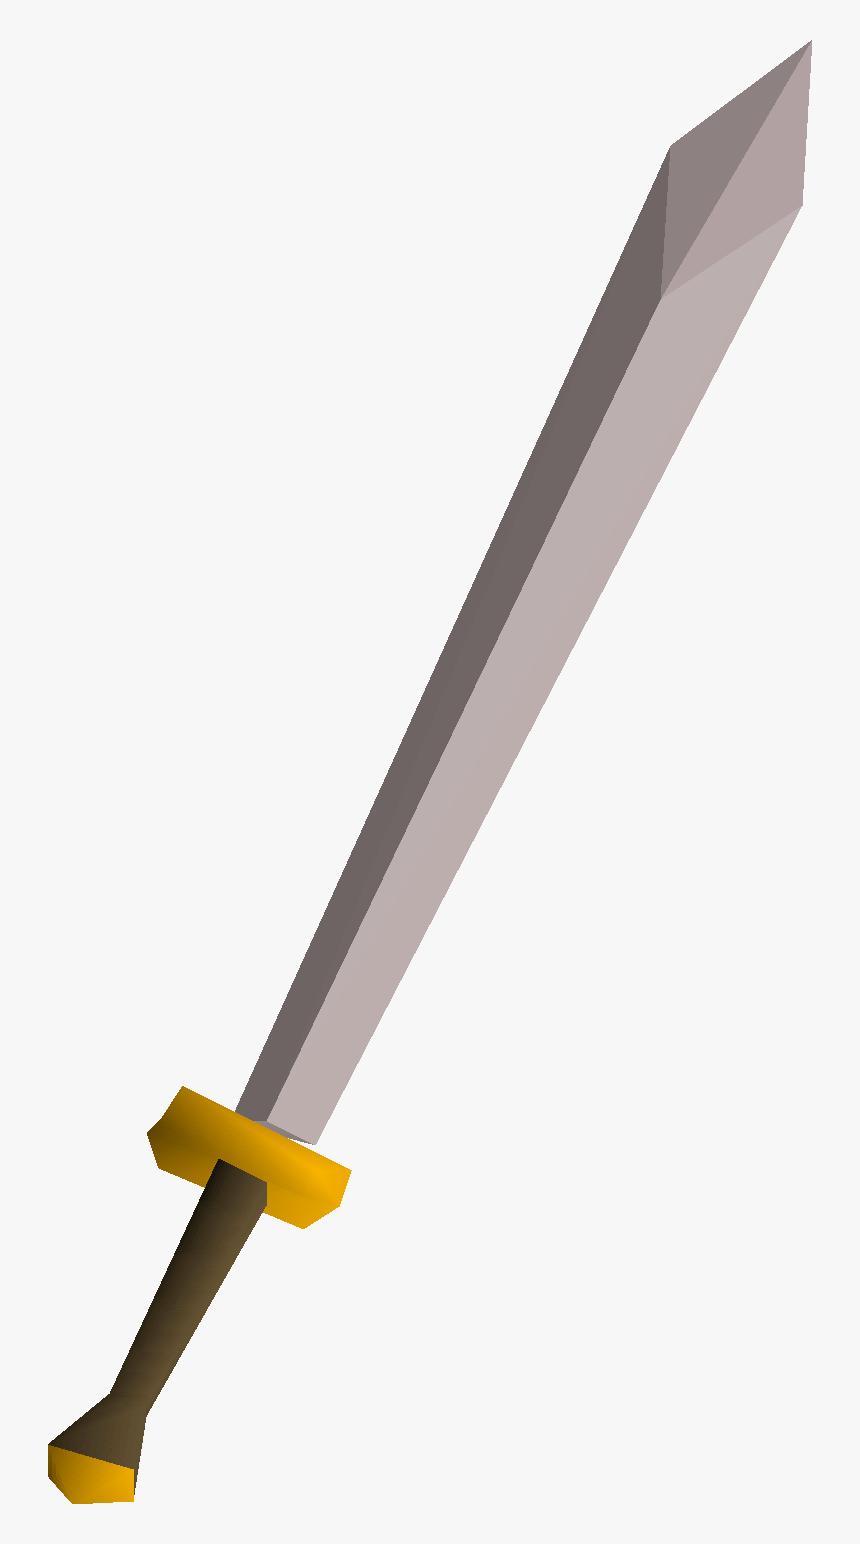 Old School Runescape Wiki - Sword, HD Png Download, Free Download